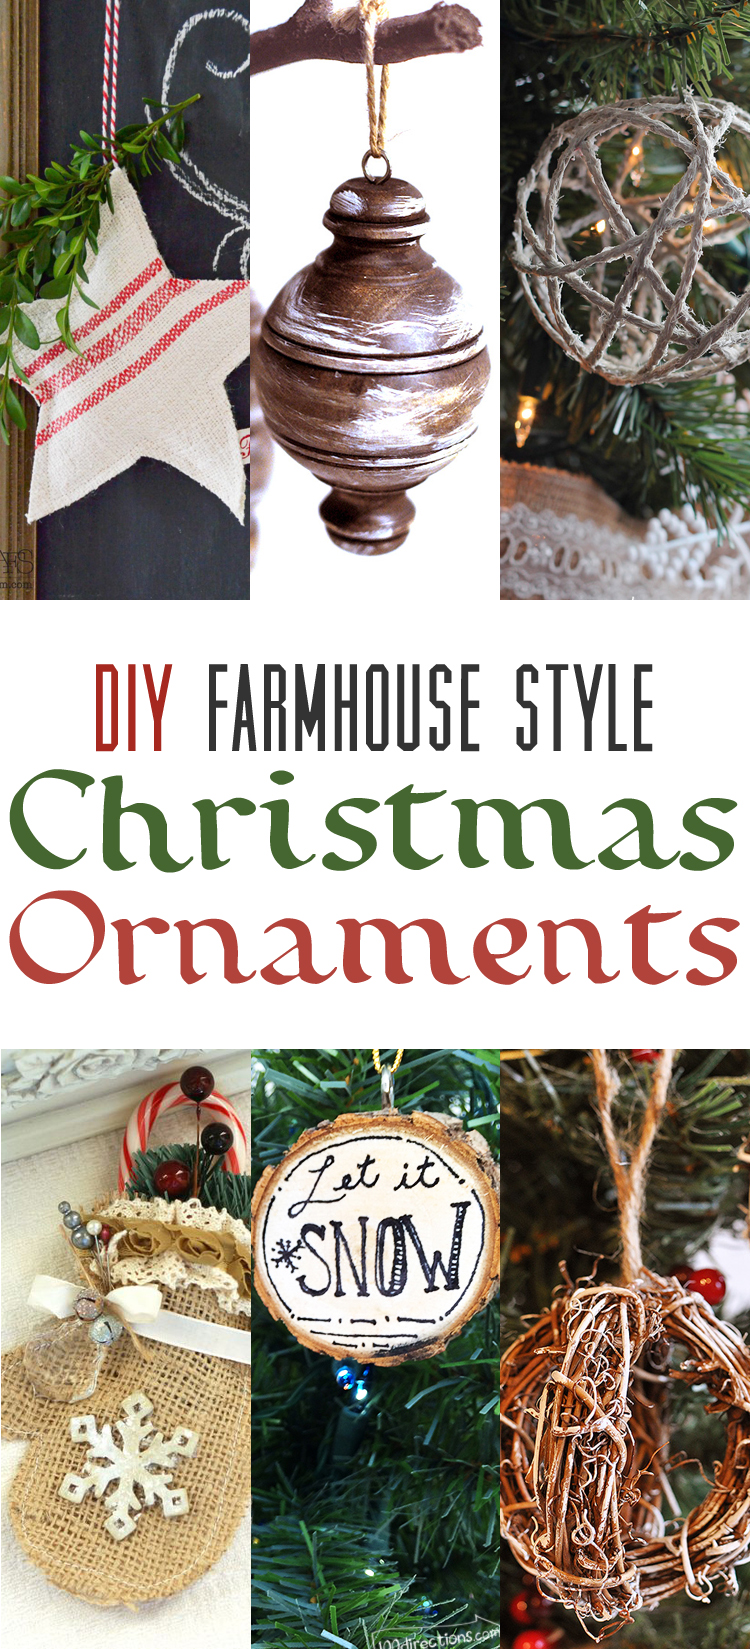 FarmhouseOrnaments-tower-001